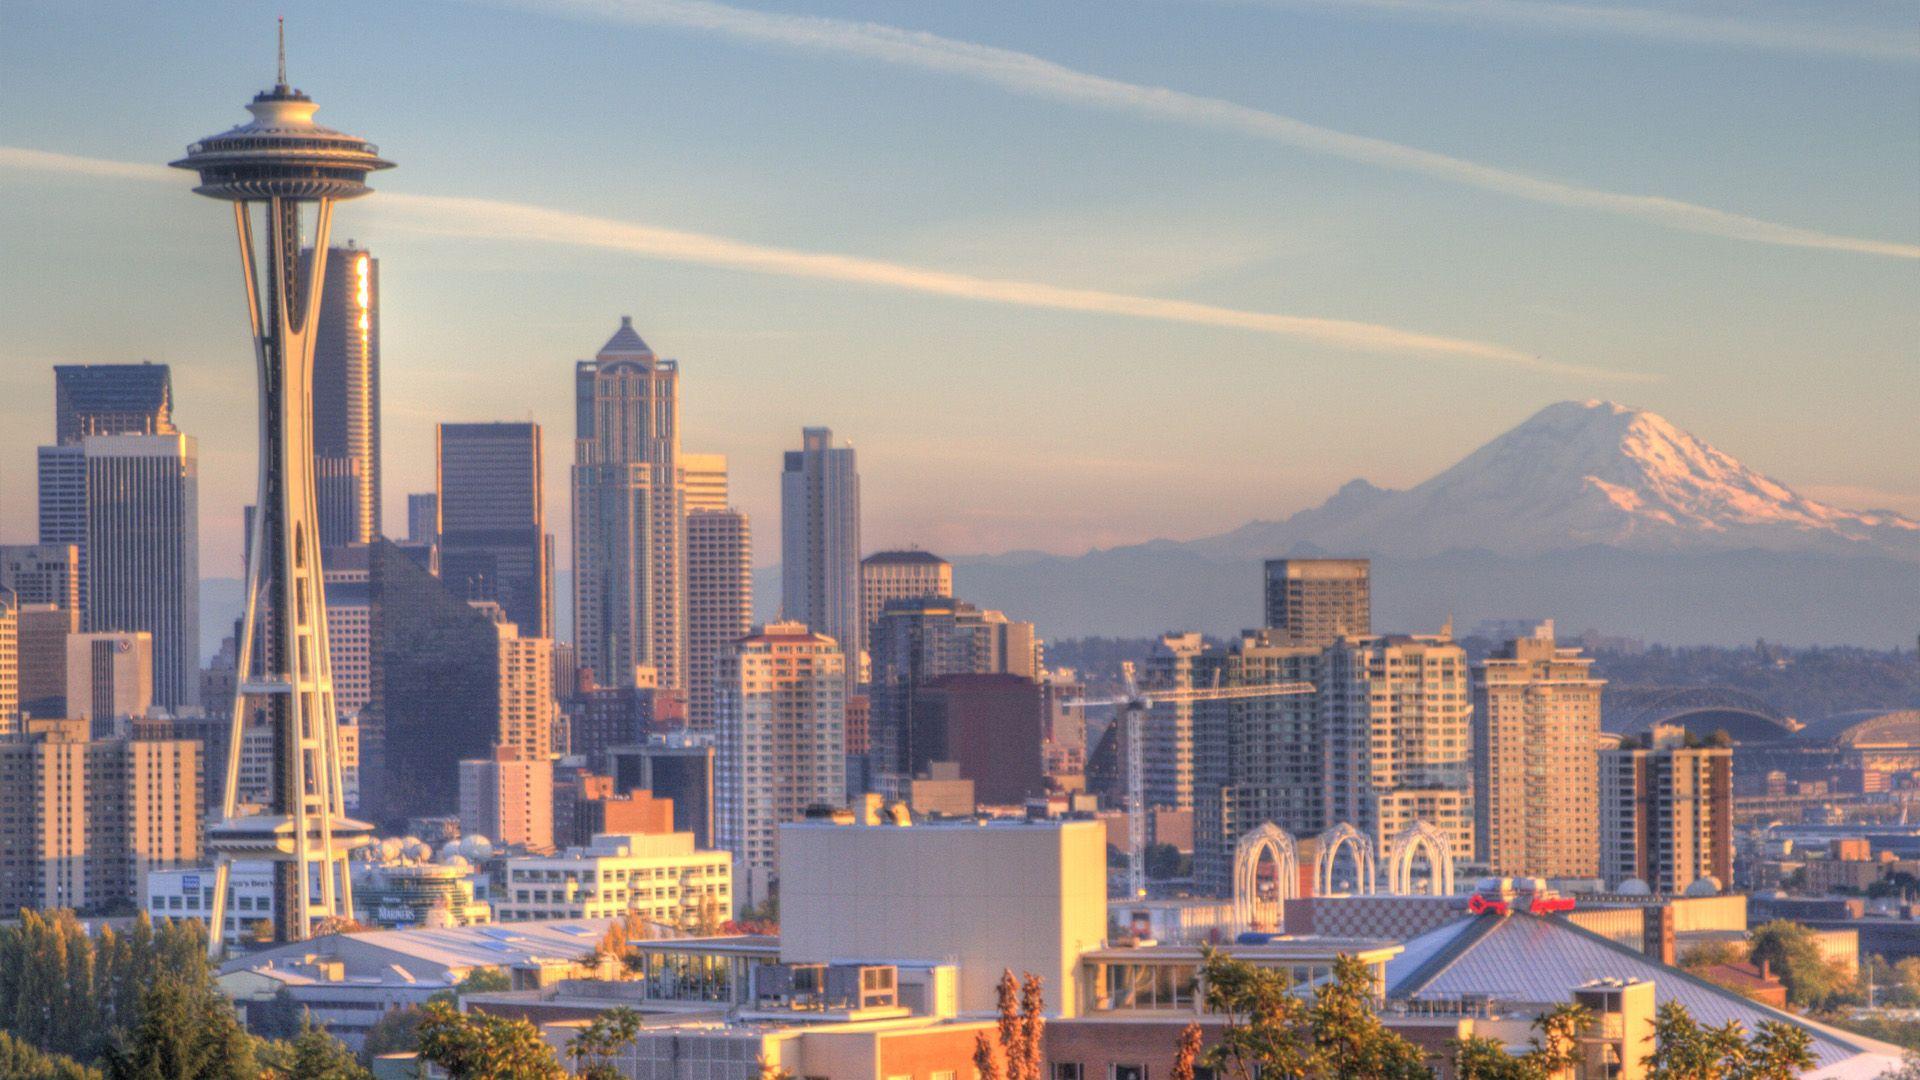 Cityscape Of Seattle Cityscape Seattle Seattle Skyline